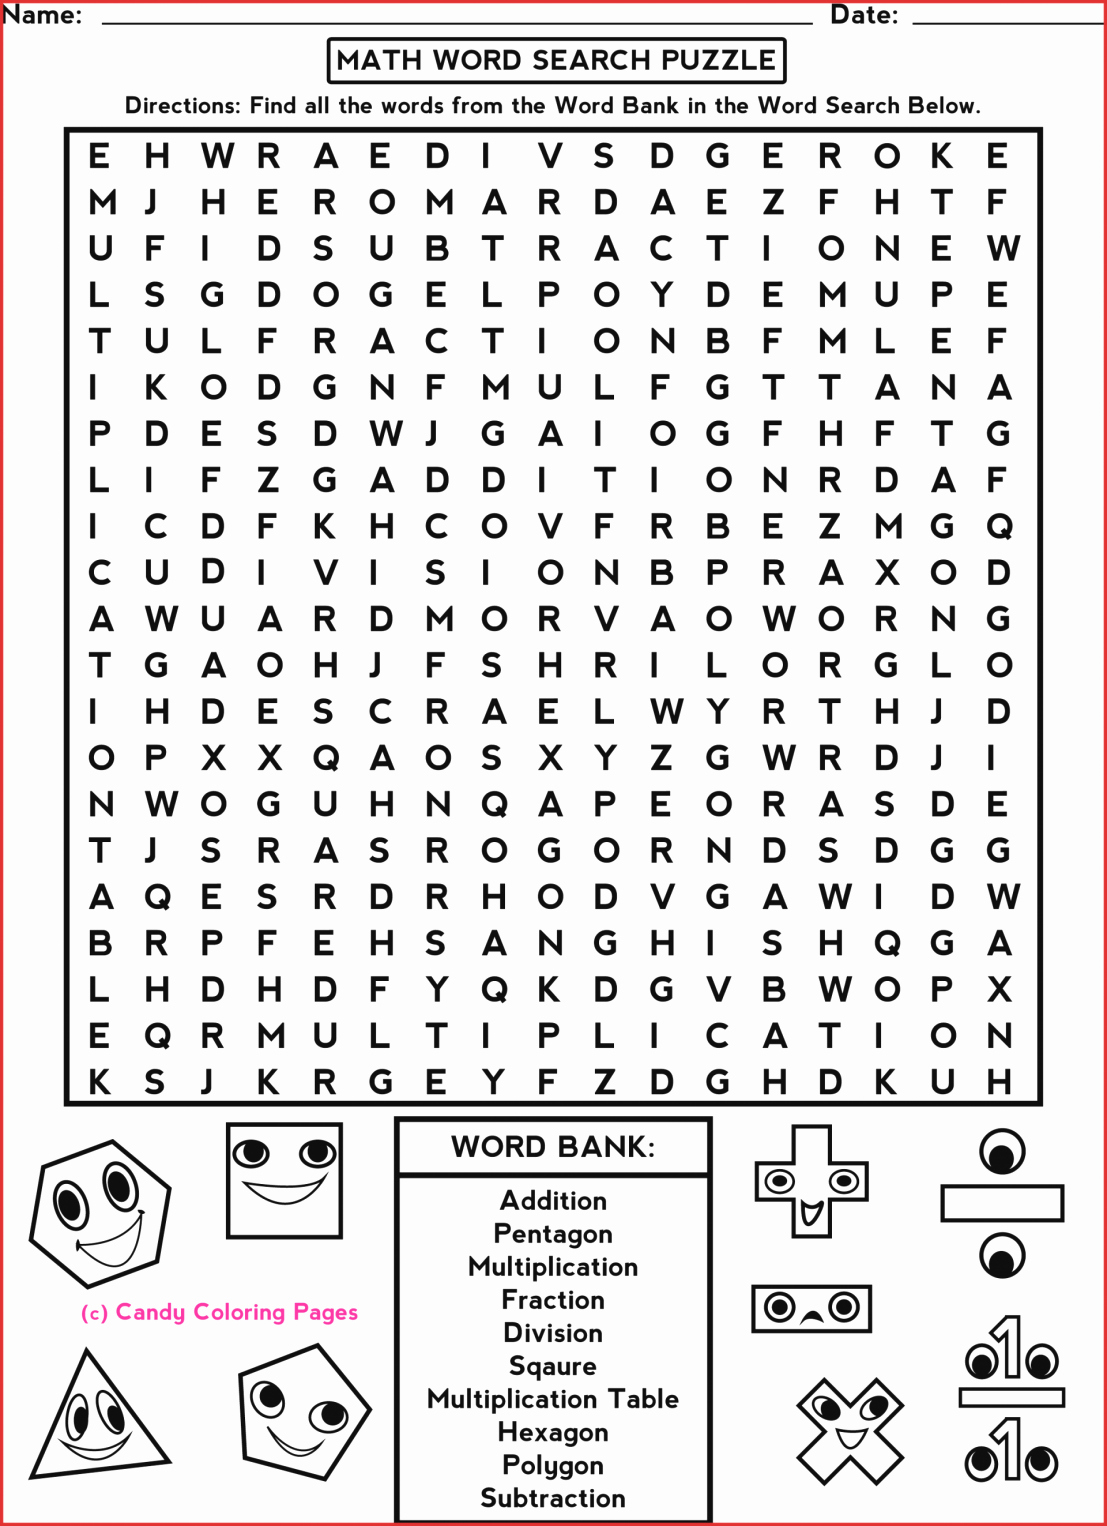 7Th Grade Crossword Puzzles Fresh 7Th Grade Math Word Search - Crossword Puzzles Printable 7Th Grade